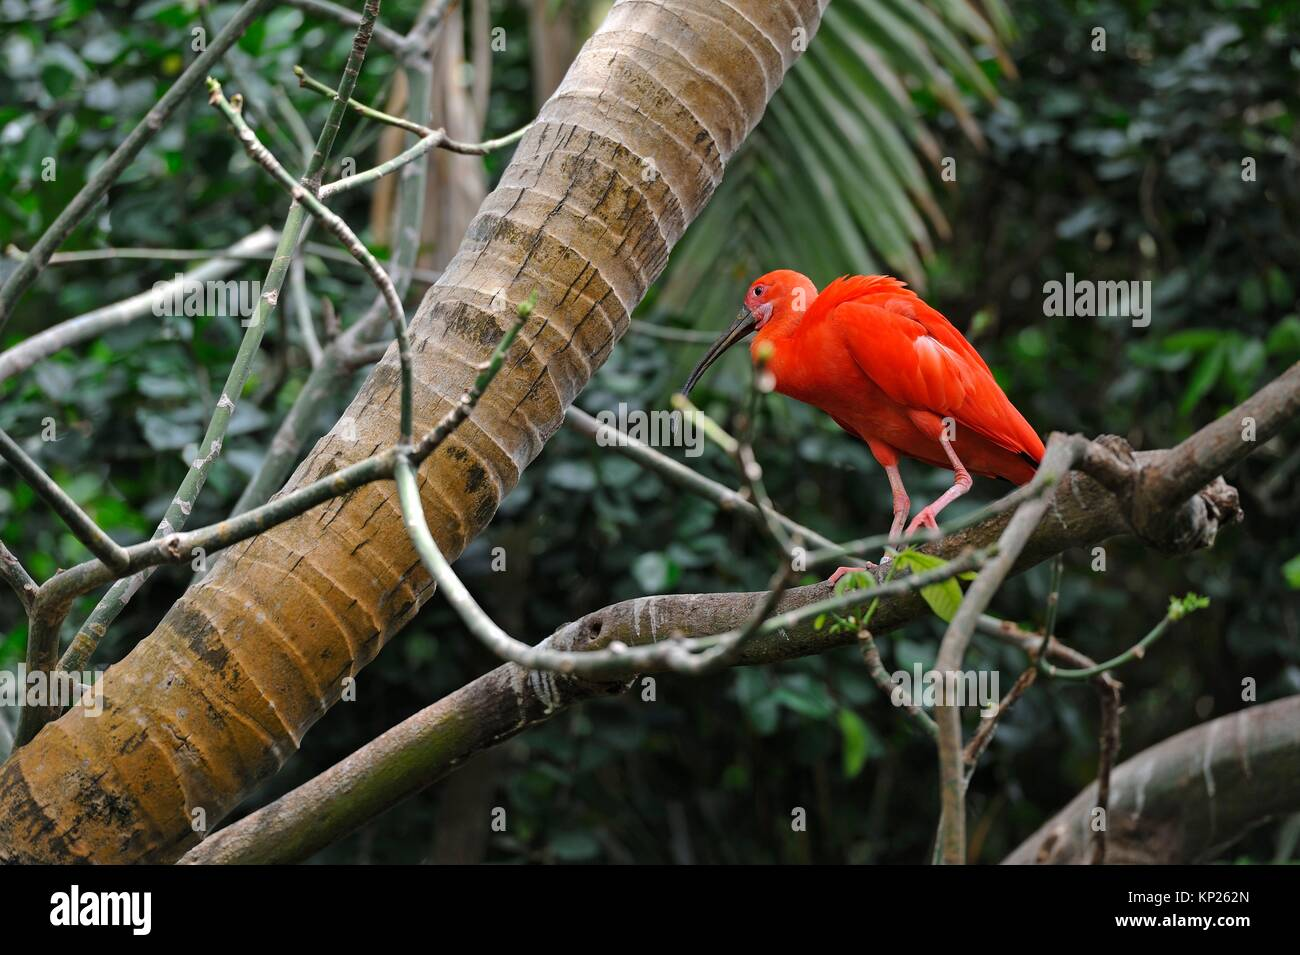 scarlet ibis inside the Rainforest Pyramid, Moody Gardens, Galveston island, Gulf of Mexico, Texas, United States - Stock Image